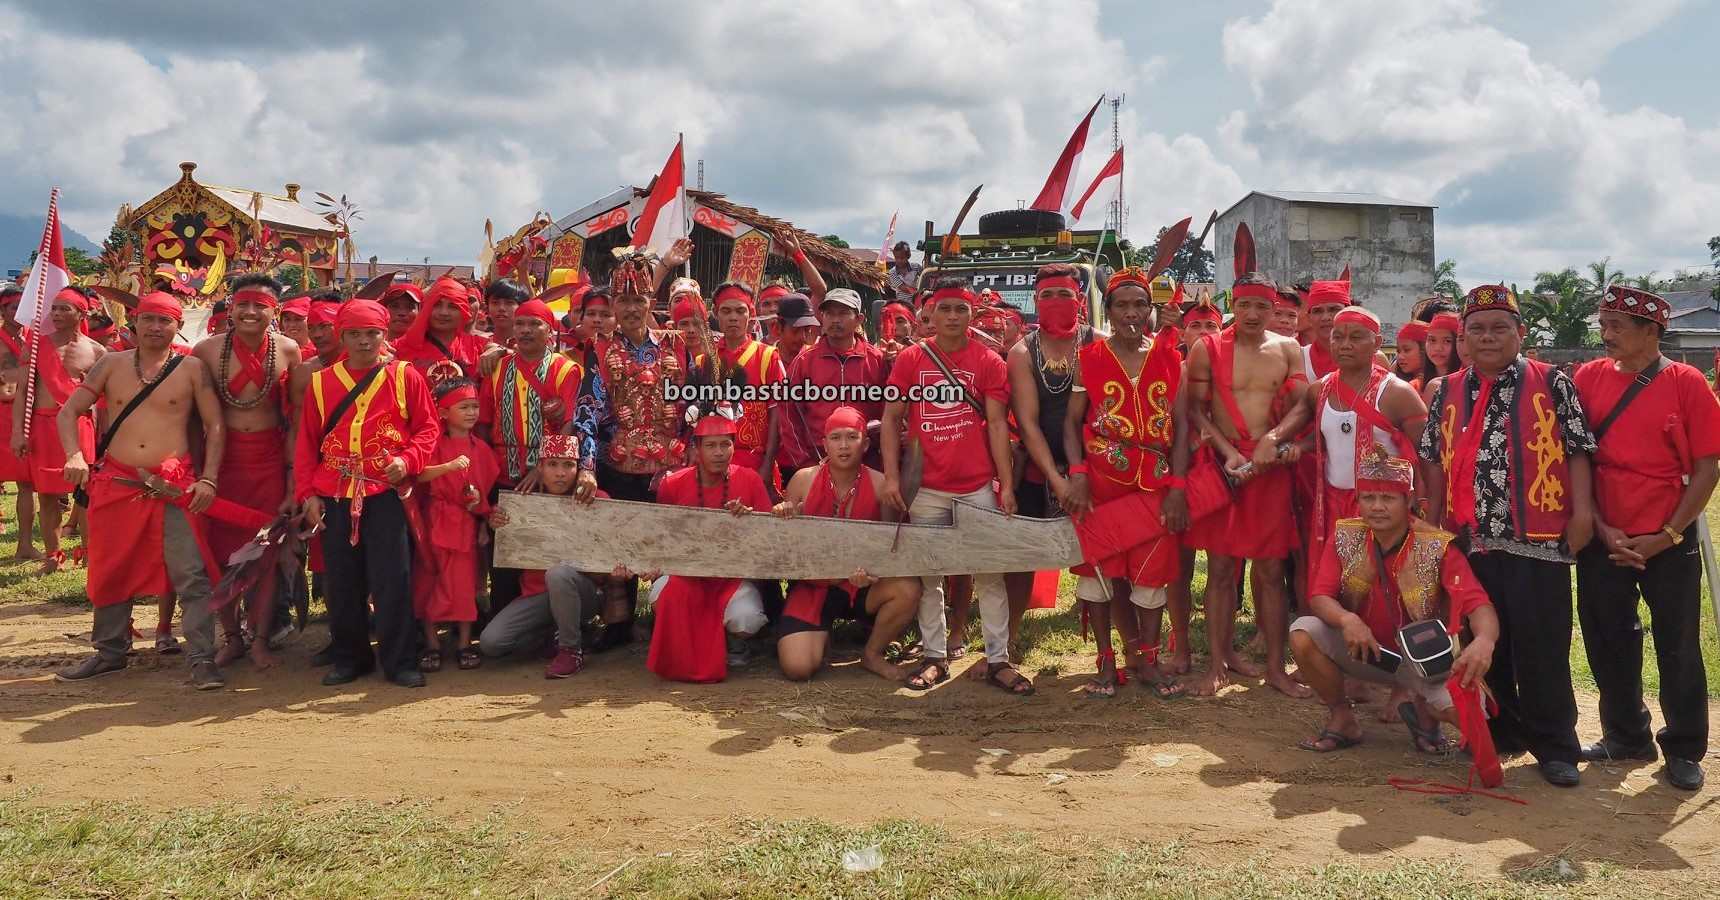 Festival Budaya Dayak, authentic, indigenous, culture, native, tribal, Indonesia, West Kalimantan, Tangkitn Dayak, parang raksasa, giant machete, Obyek wisata, Tourism, travel guide, Trans Borneo